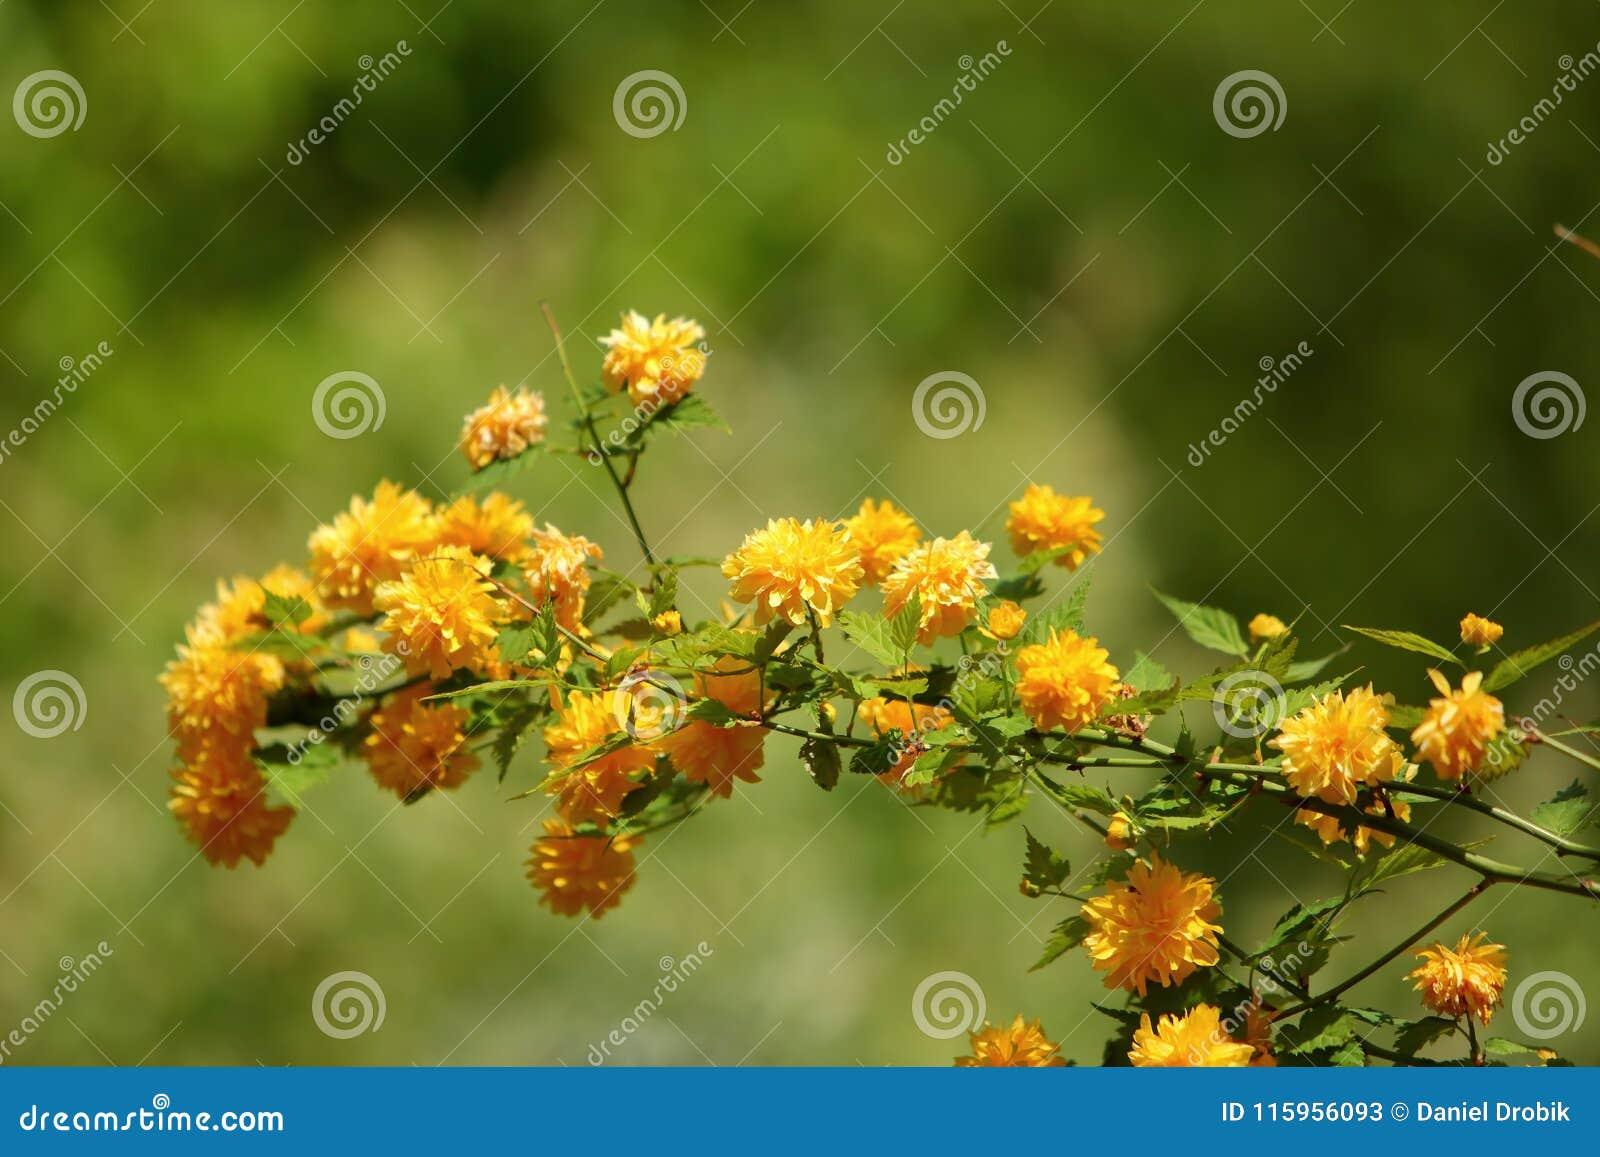 Yellow flowers on shrubs are a very popular color among various yellow flowers on shrubs are a very popular color among various types of plants mightylinksfo